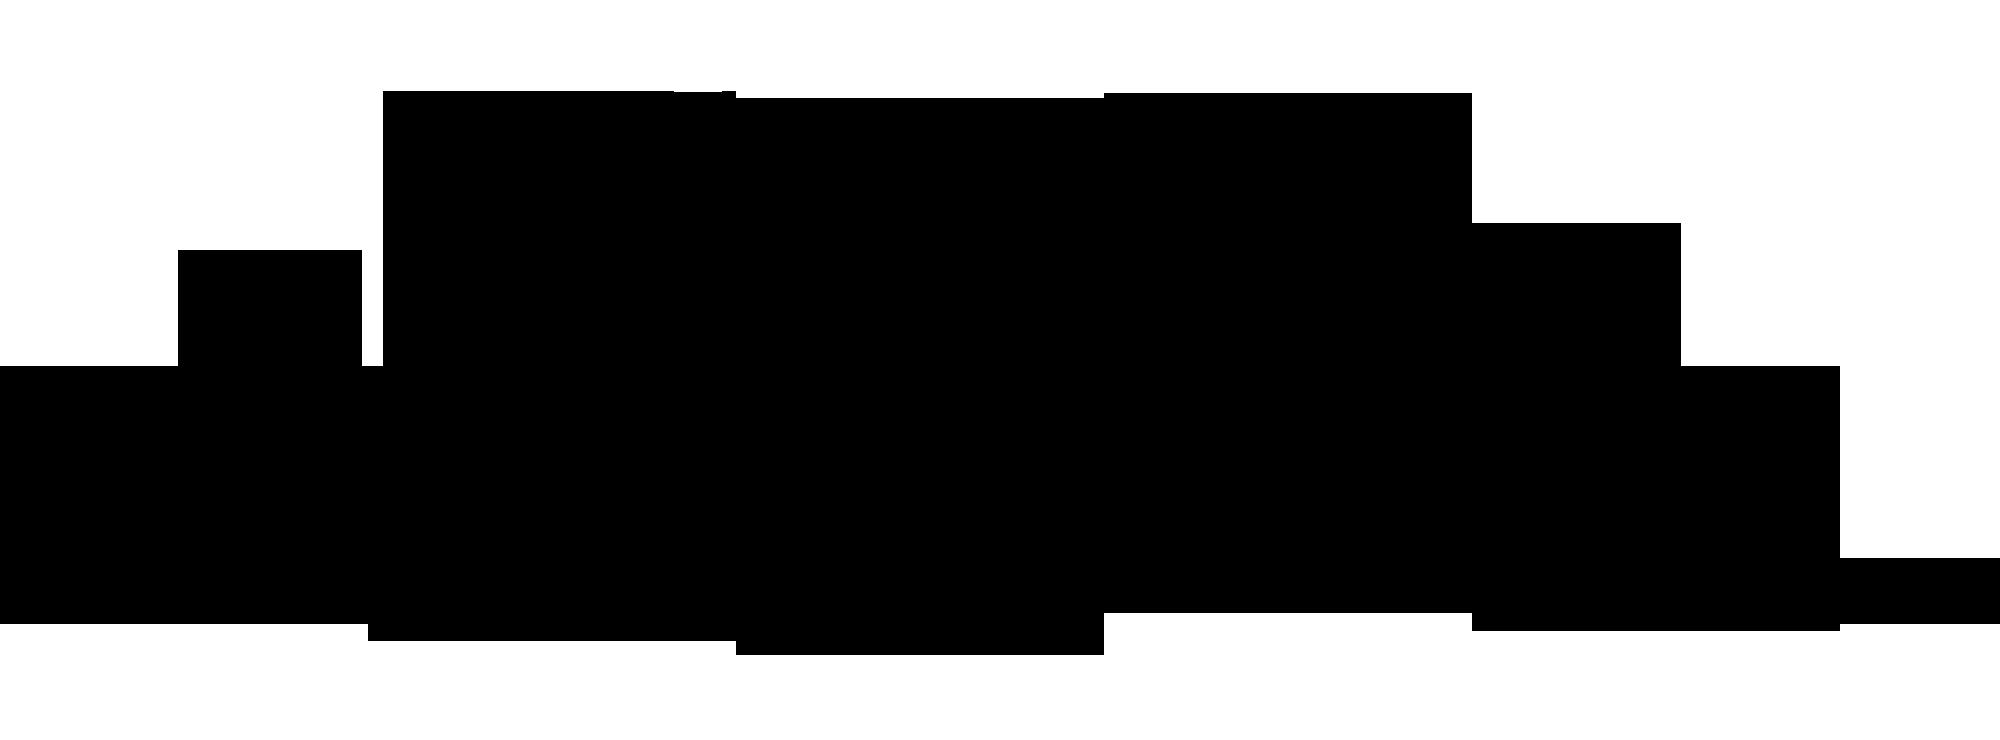 Archivo:Logo de Avatar la leyenda de Aang.png - Wikipedia, la enciclopedia libre